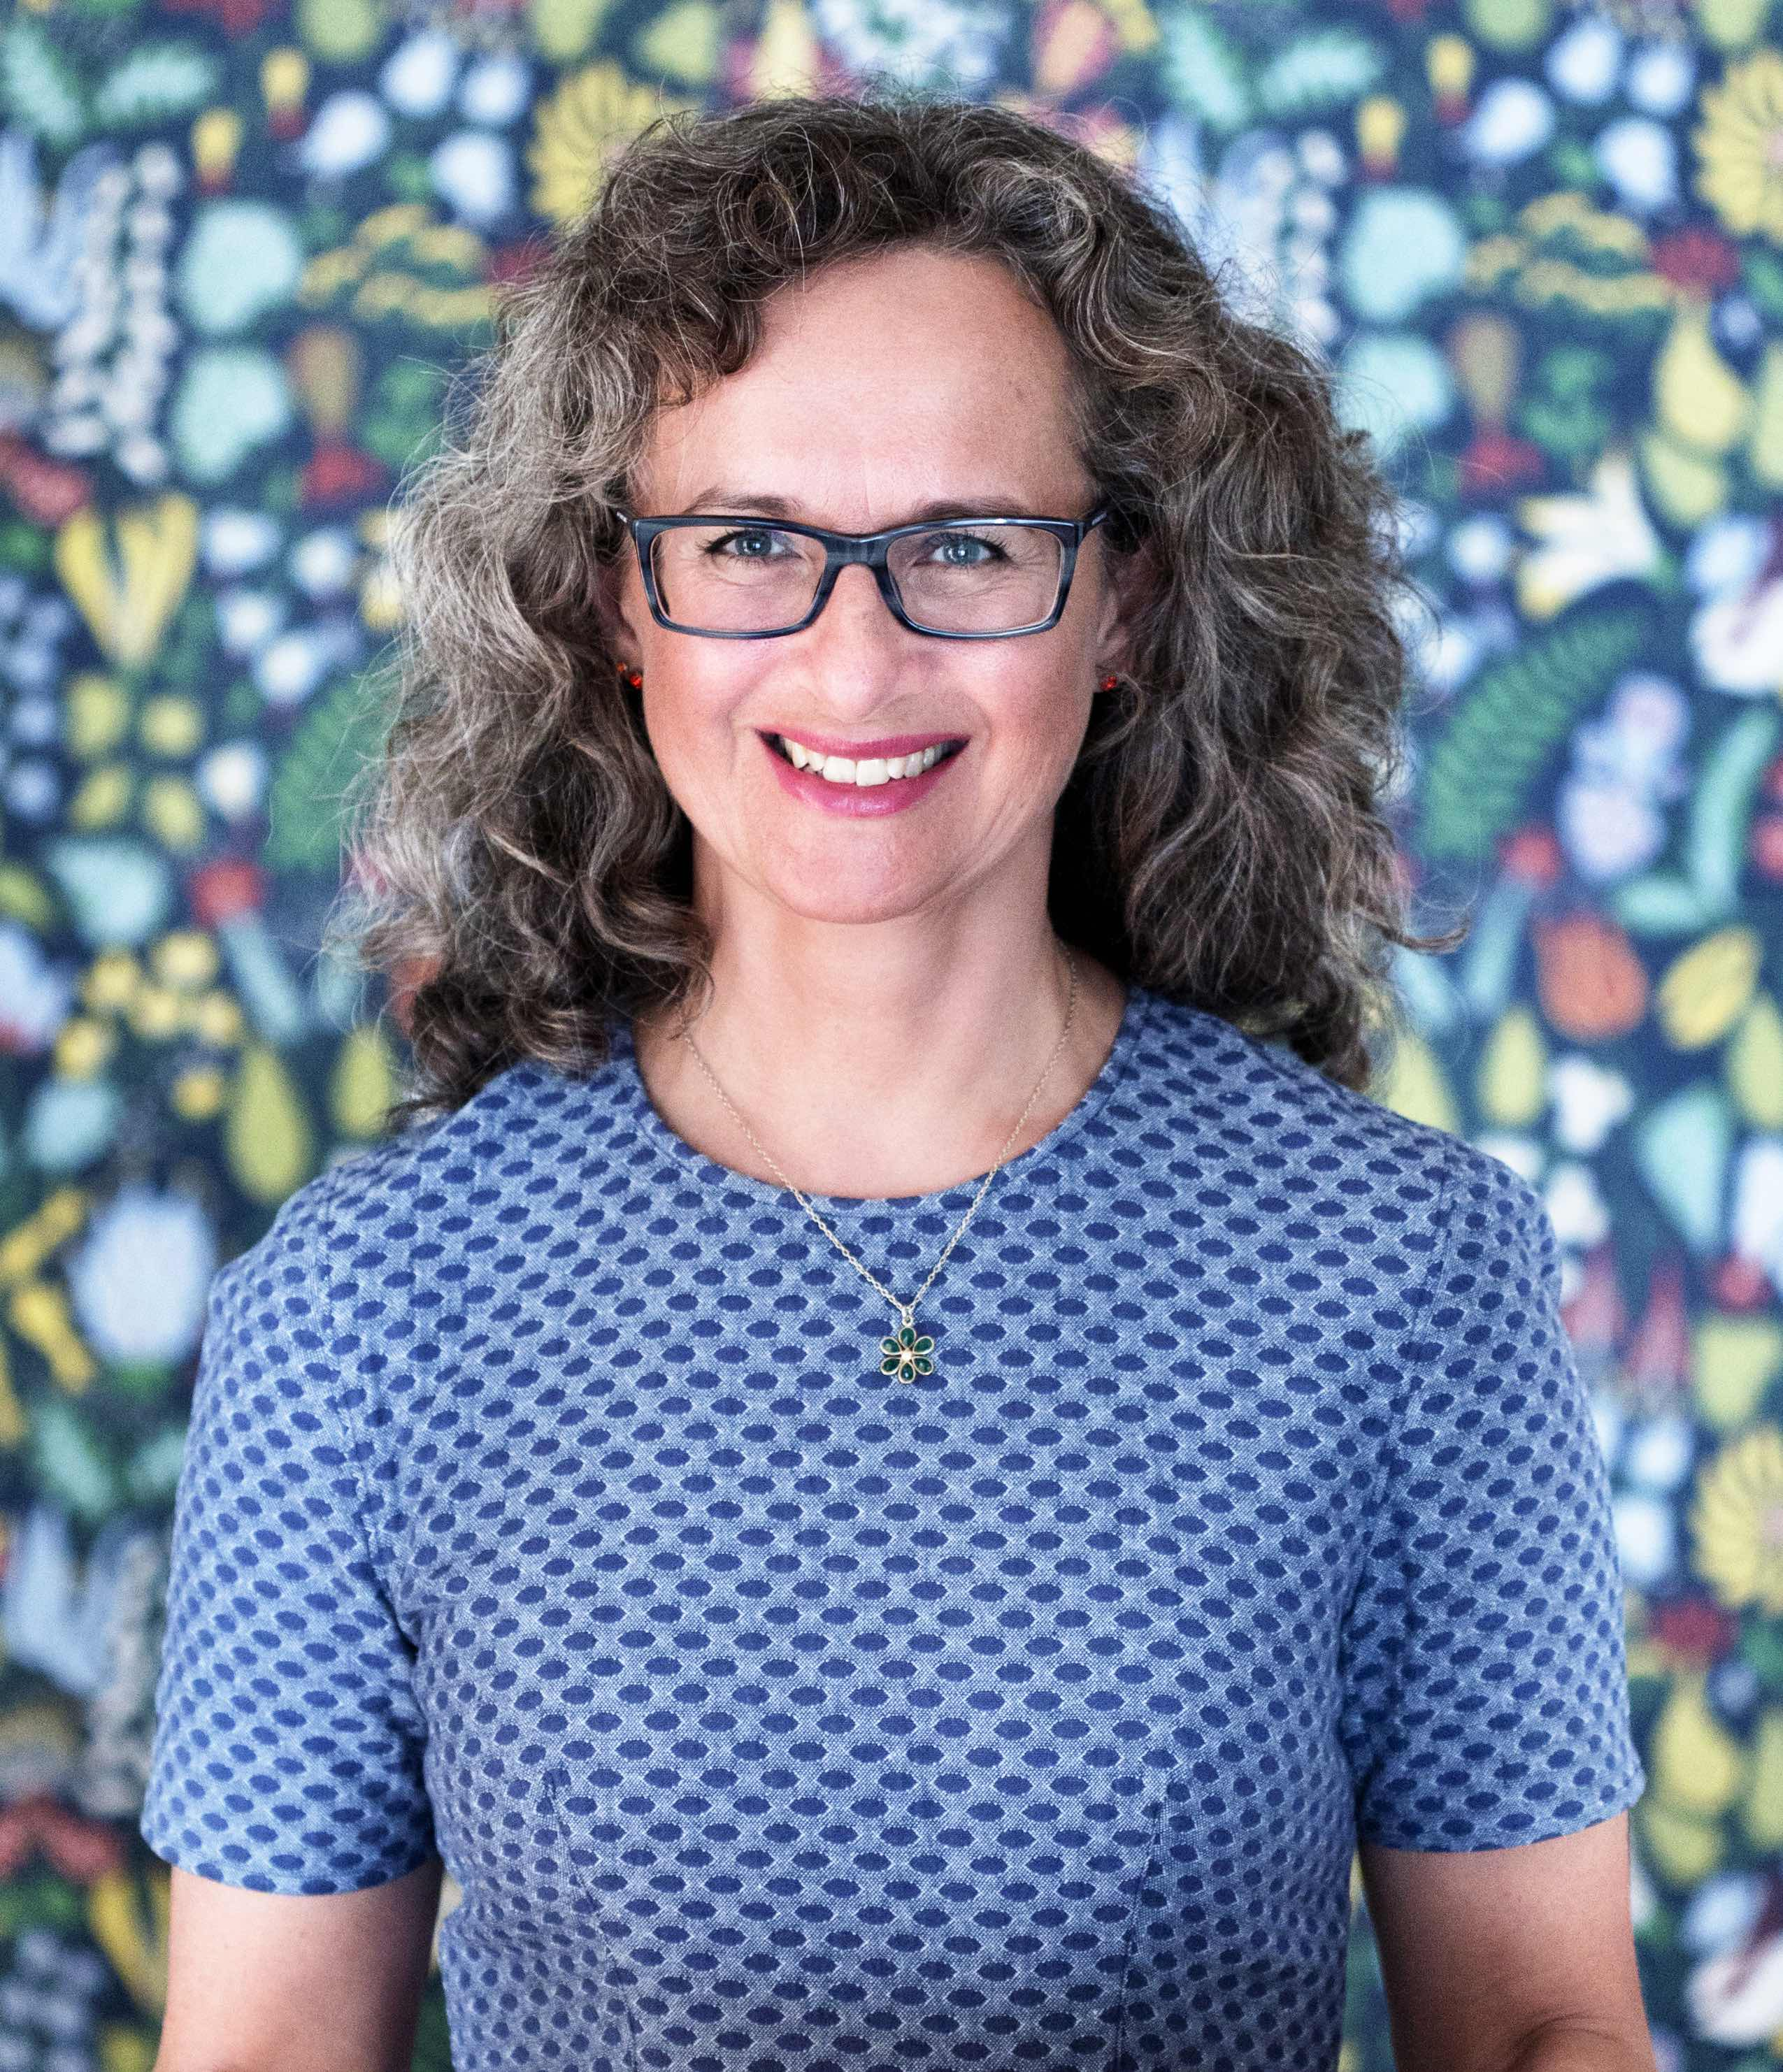 Anne Aobadia